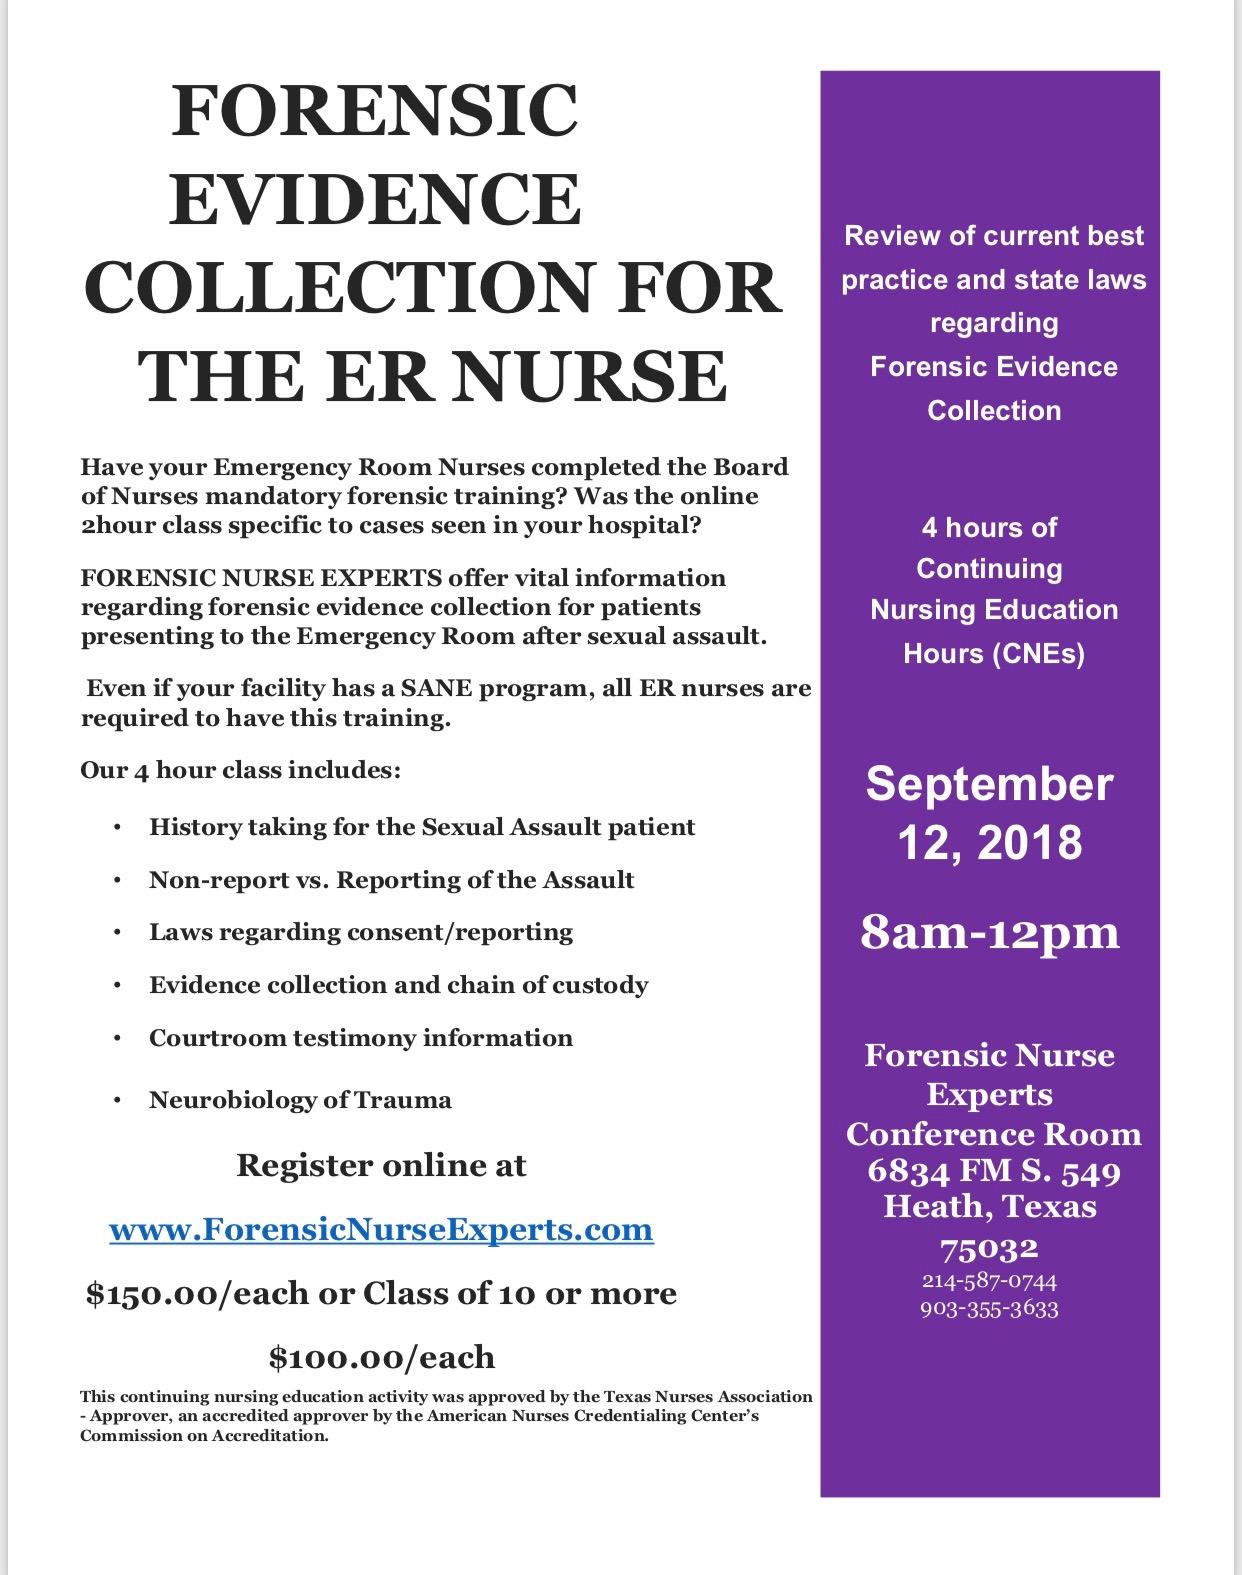 Forensic Evidence Collection For The Er Nurse Iafn Texas